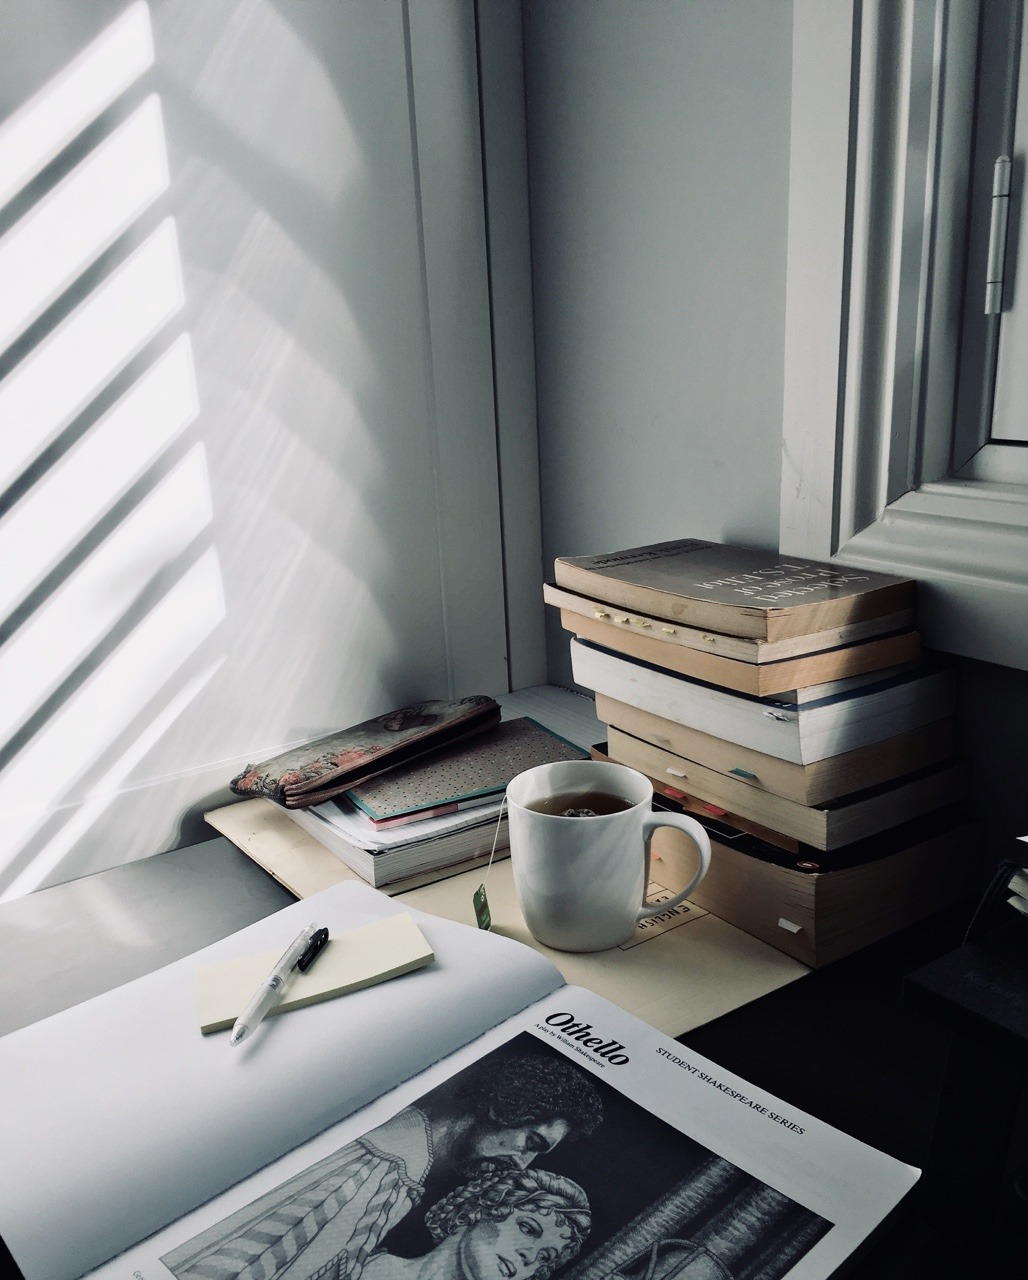 inspiration, motivation, and new image